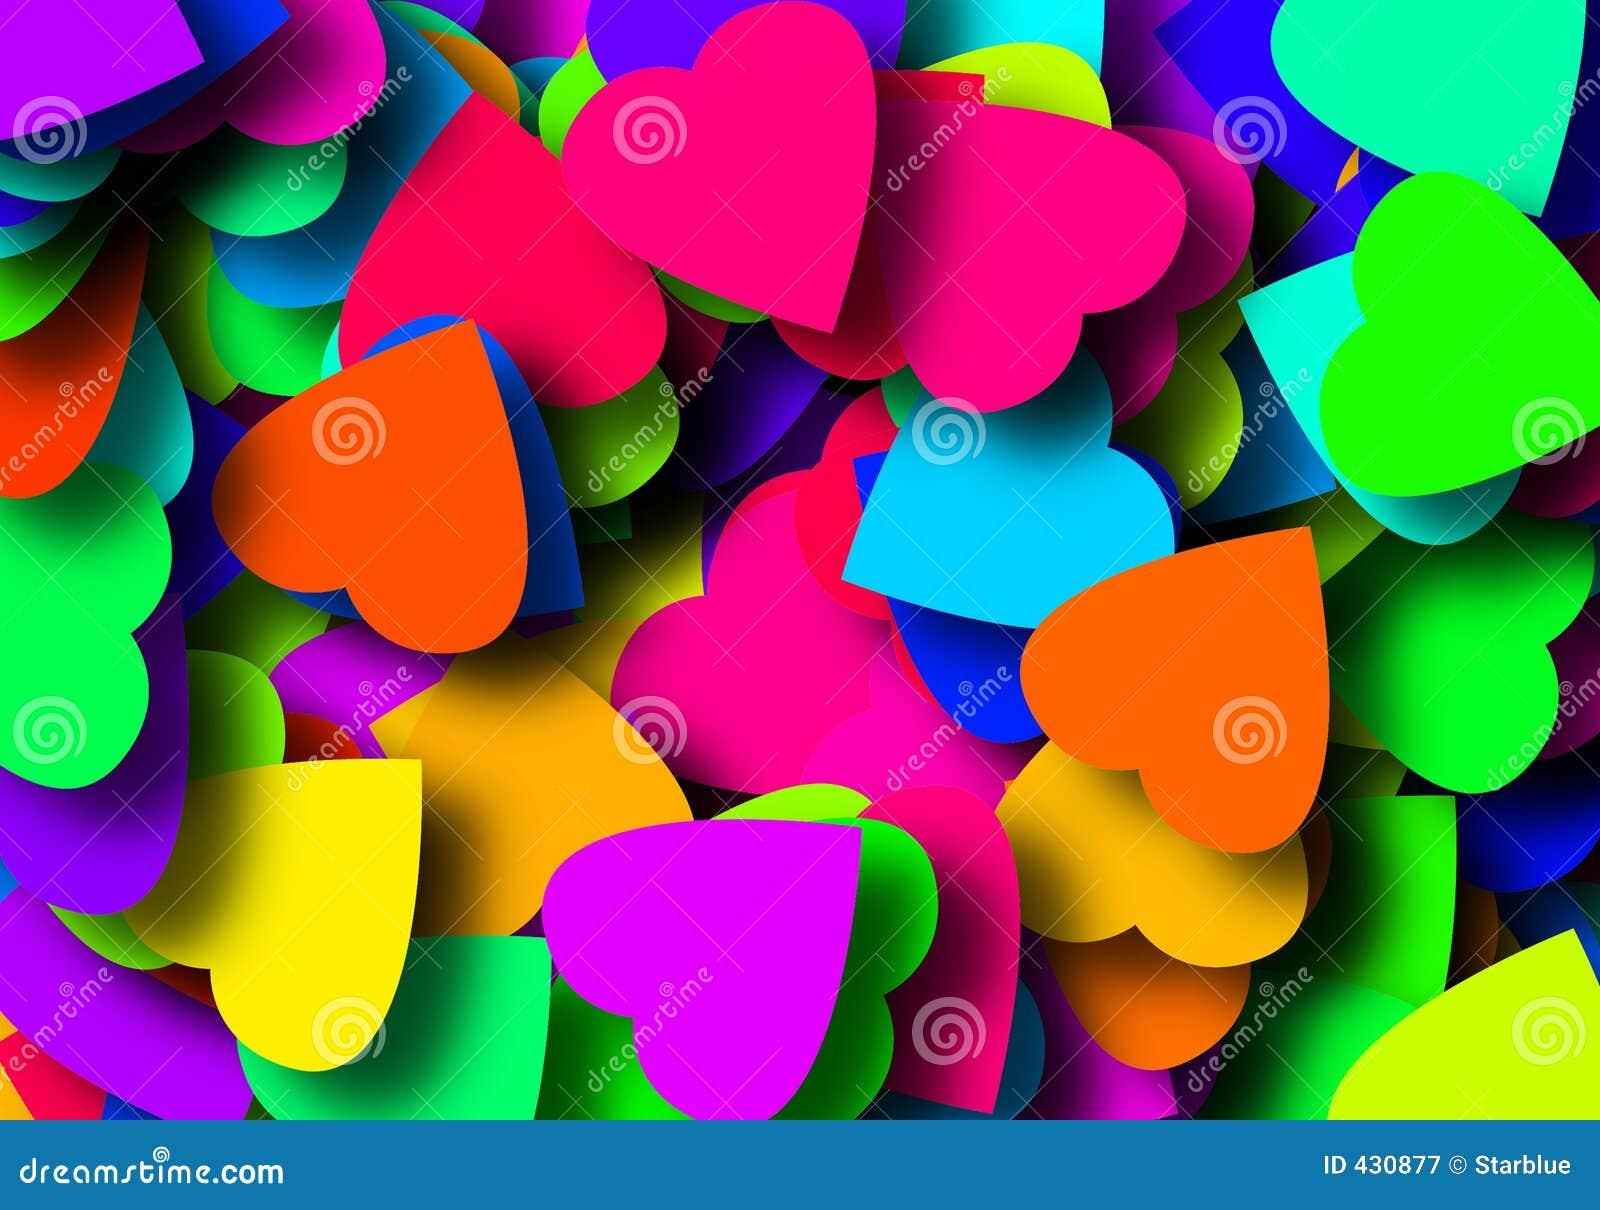 Colored valentines